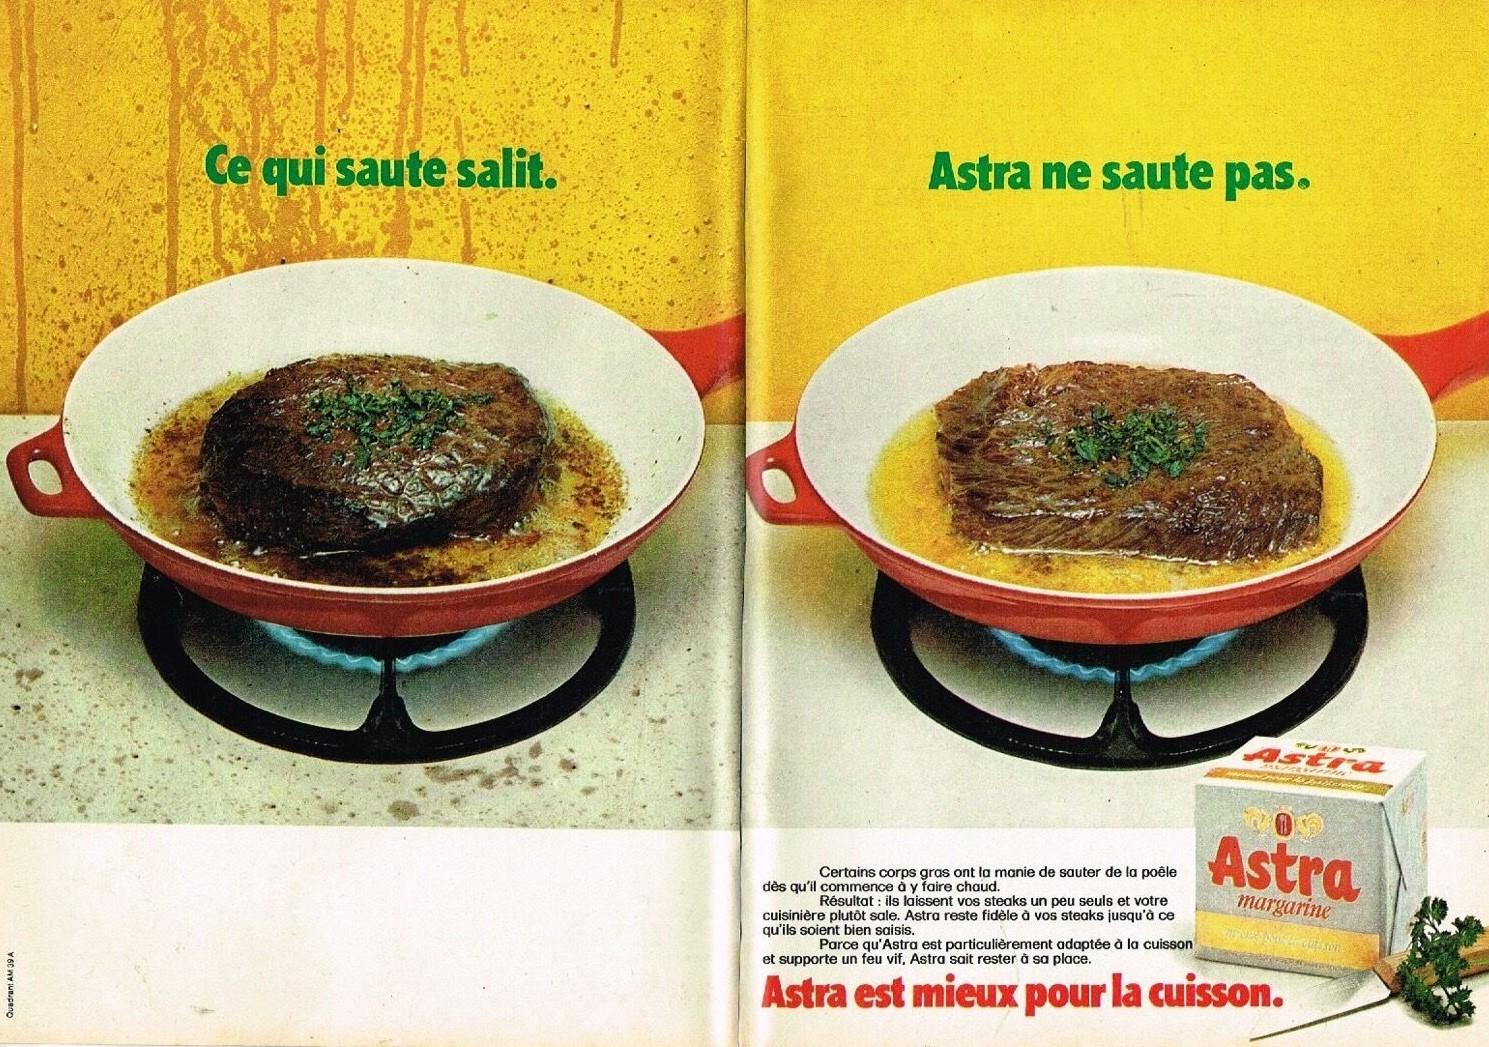 1975 La margarine Astra